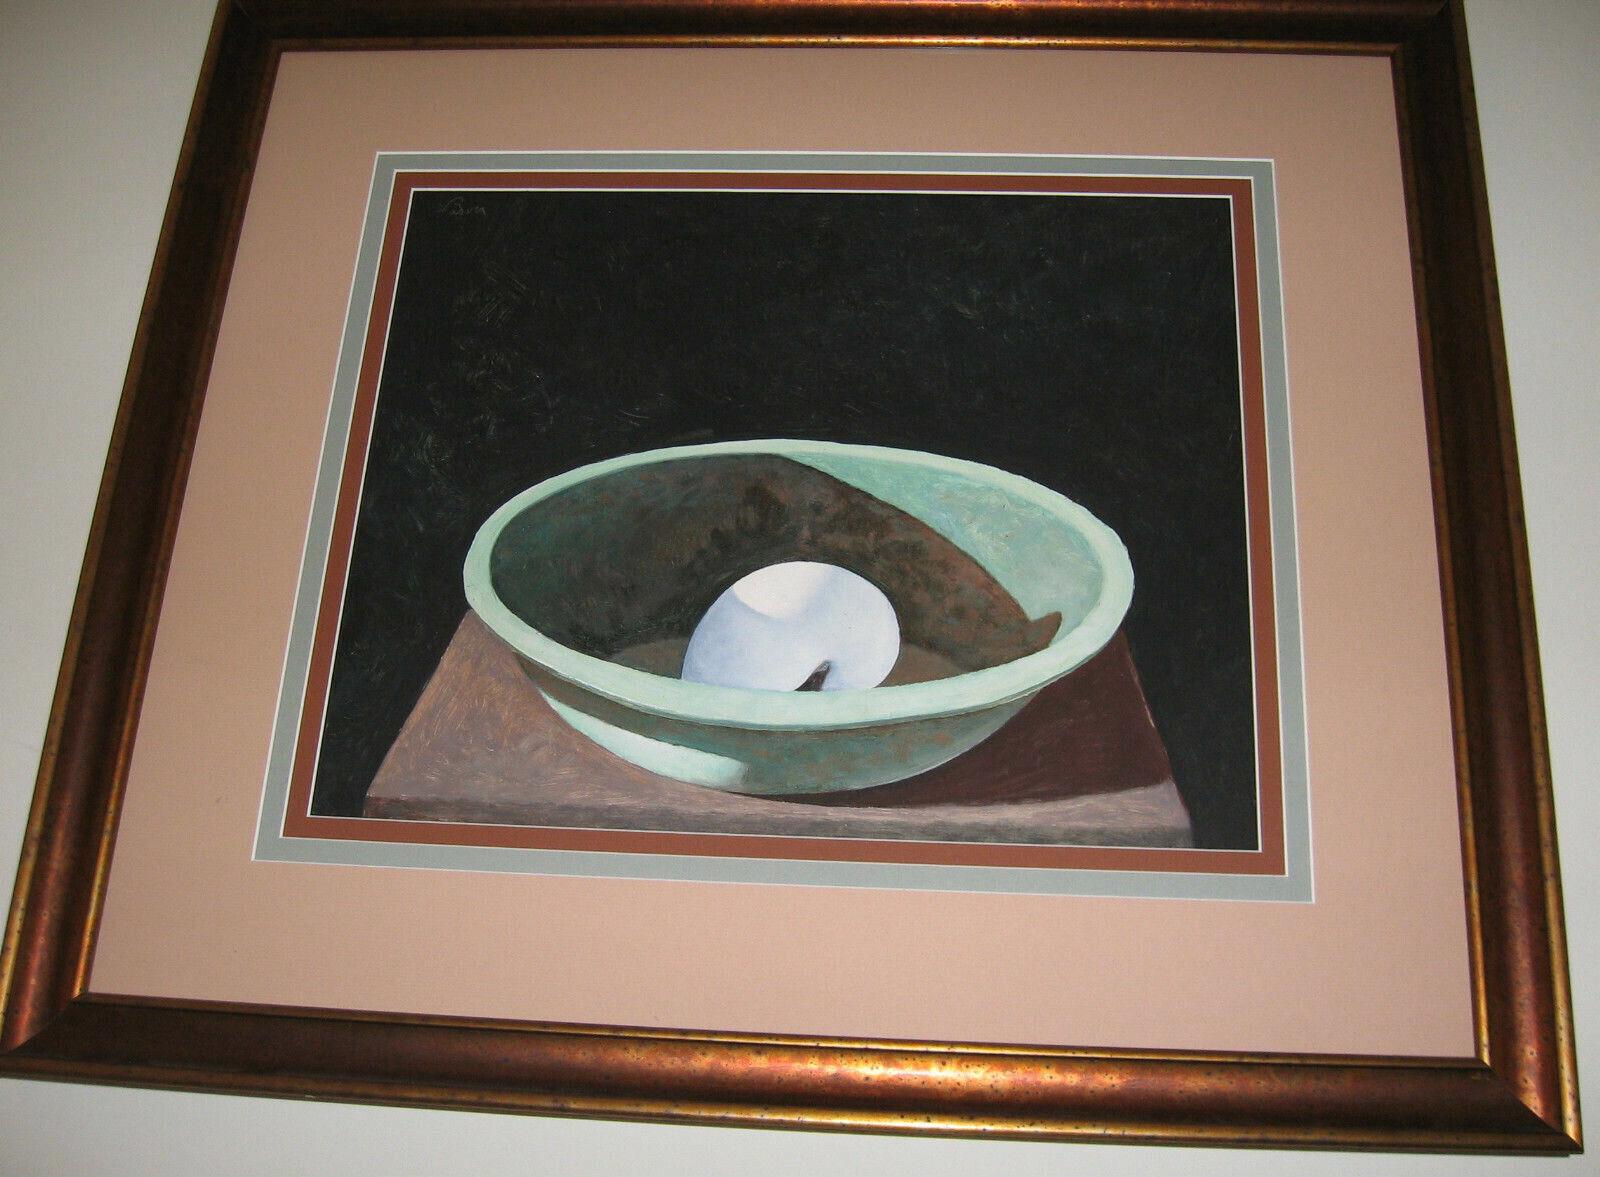 Miguel Padura - Original Latin American Oil Painting - $9,999.00